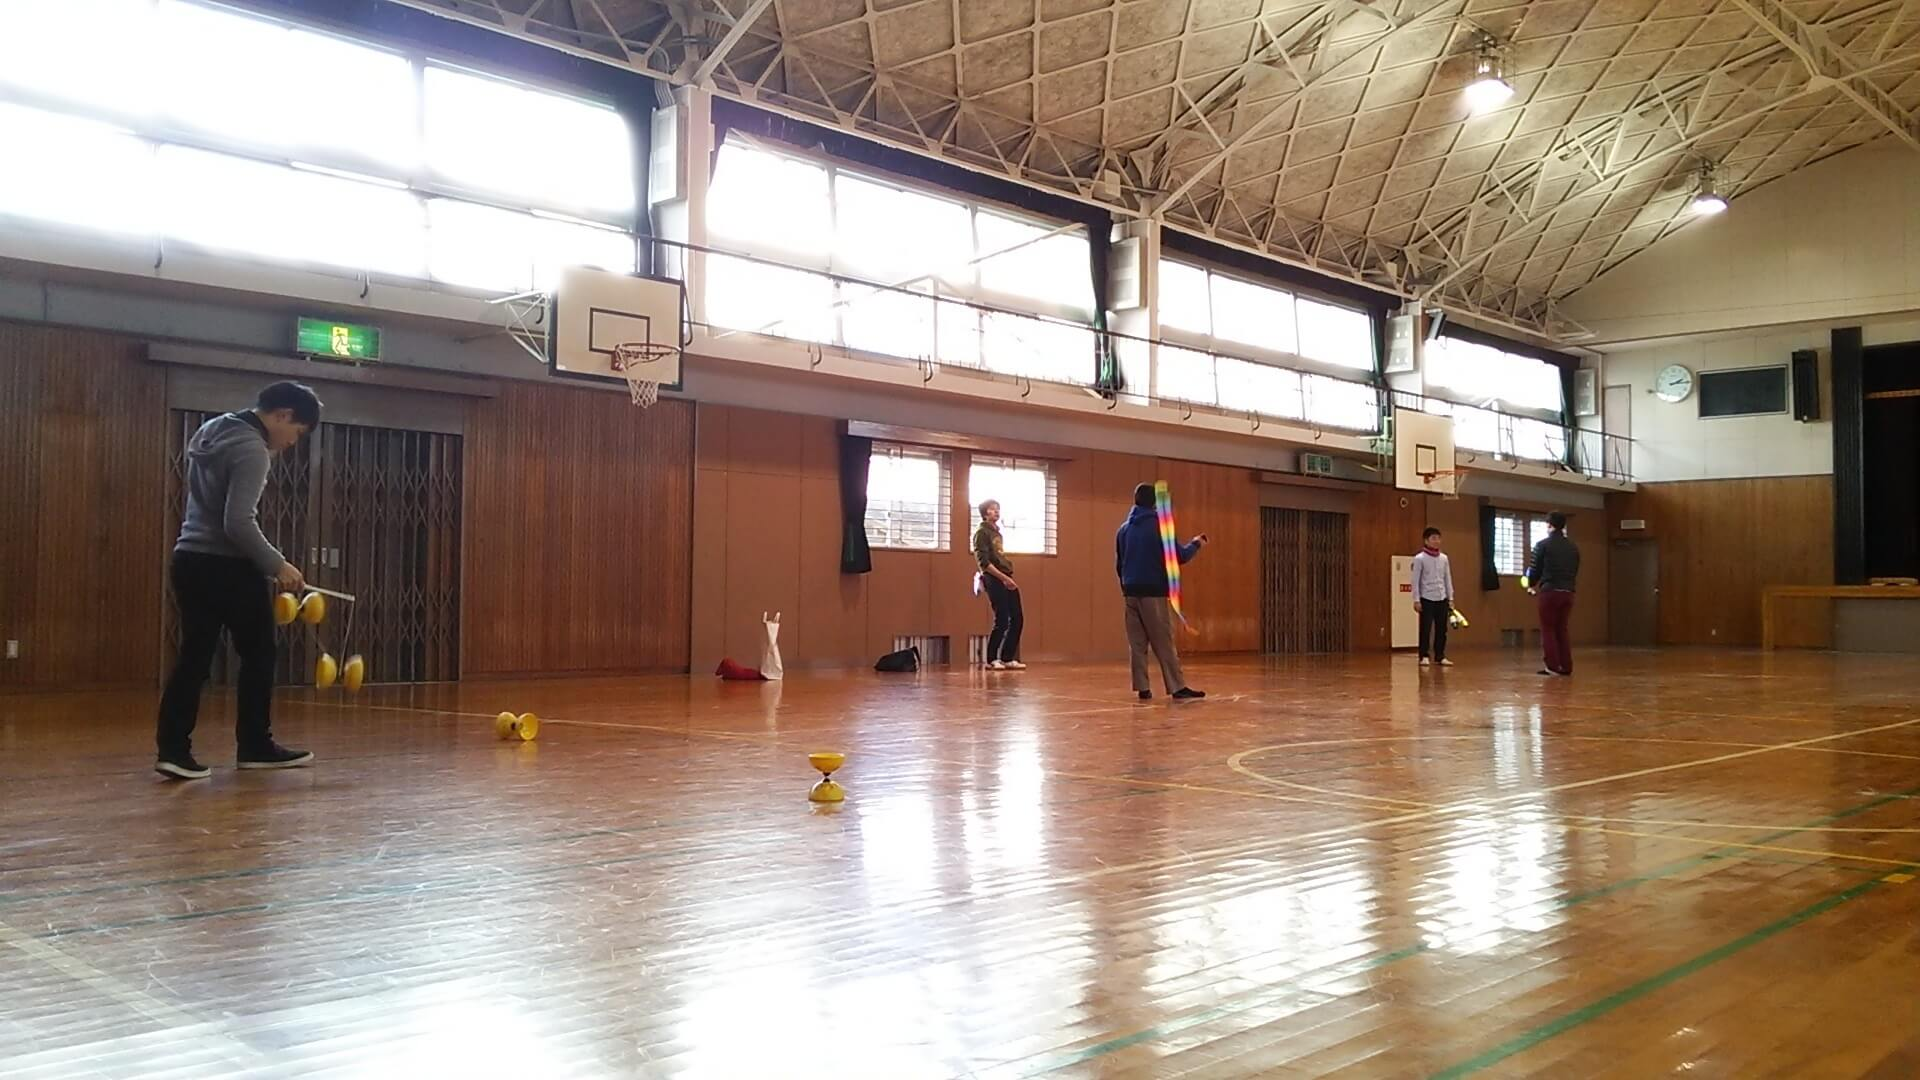 ( C ) 岡山ジャグリングクラブ http://ojc.seesaa.net/article/413329186.html